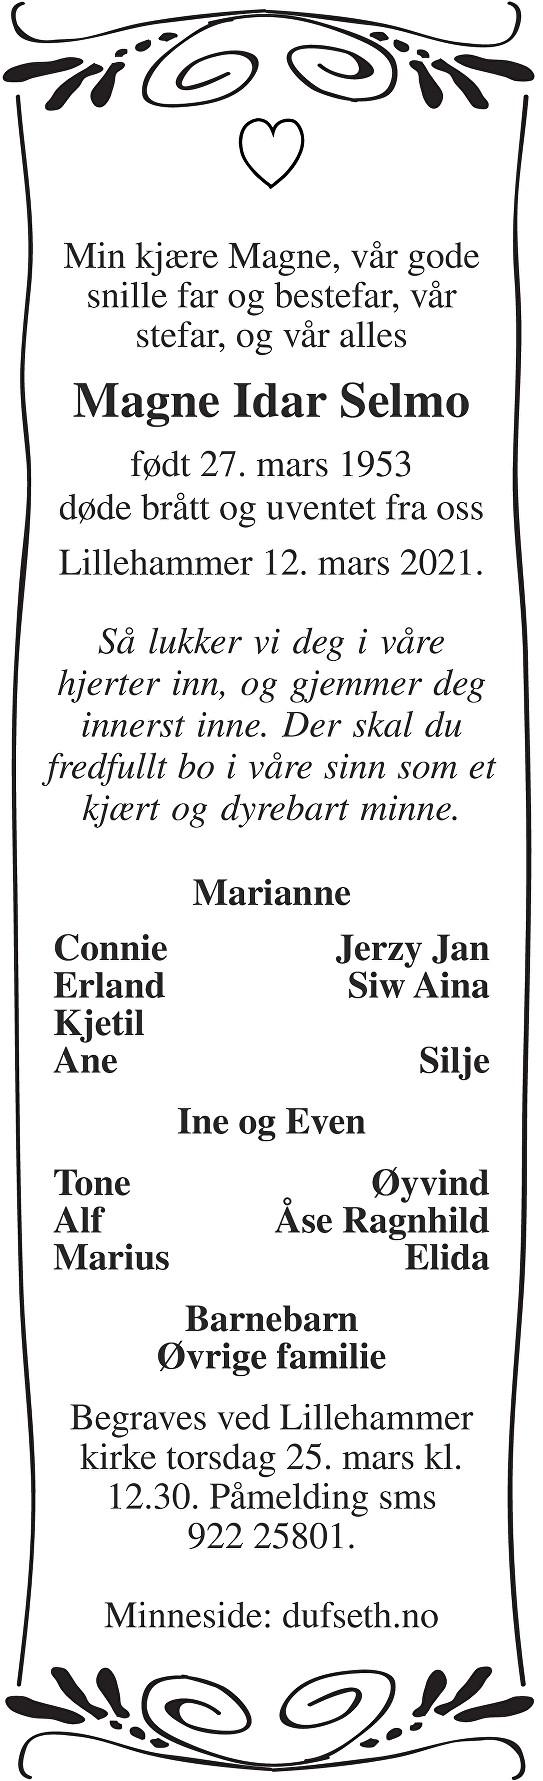 Magne Idar Selmo Dødsannonse